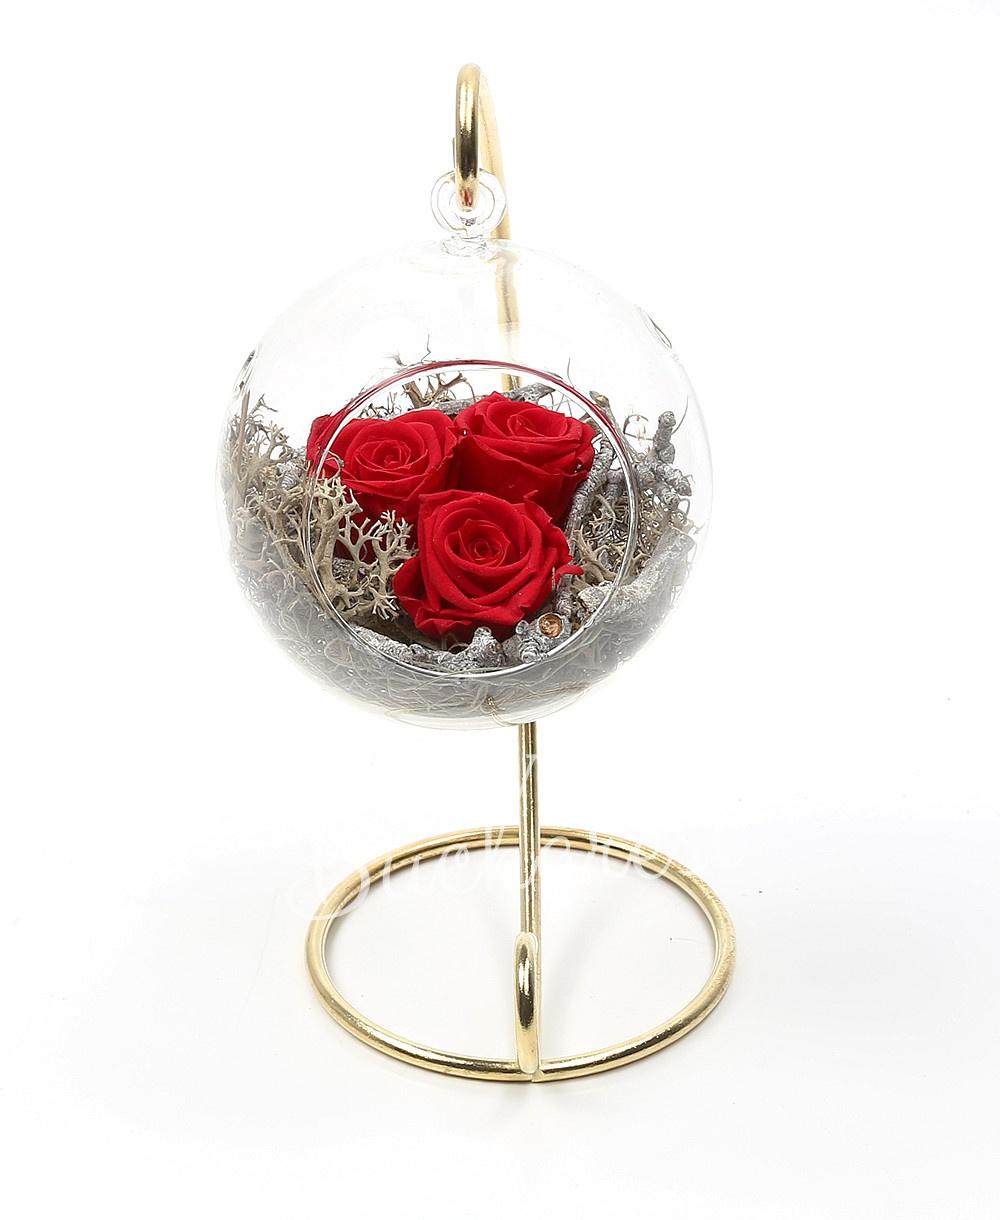 3 cryogenic roses in glass globe